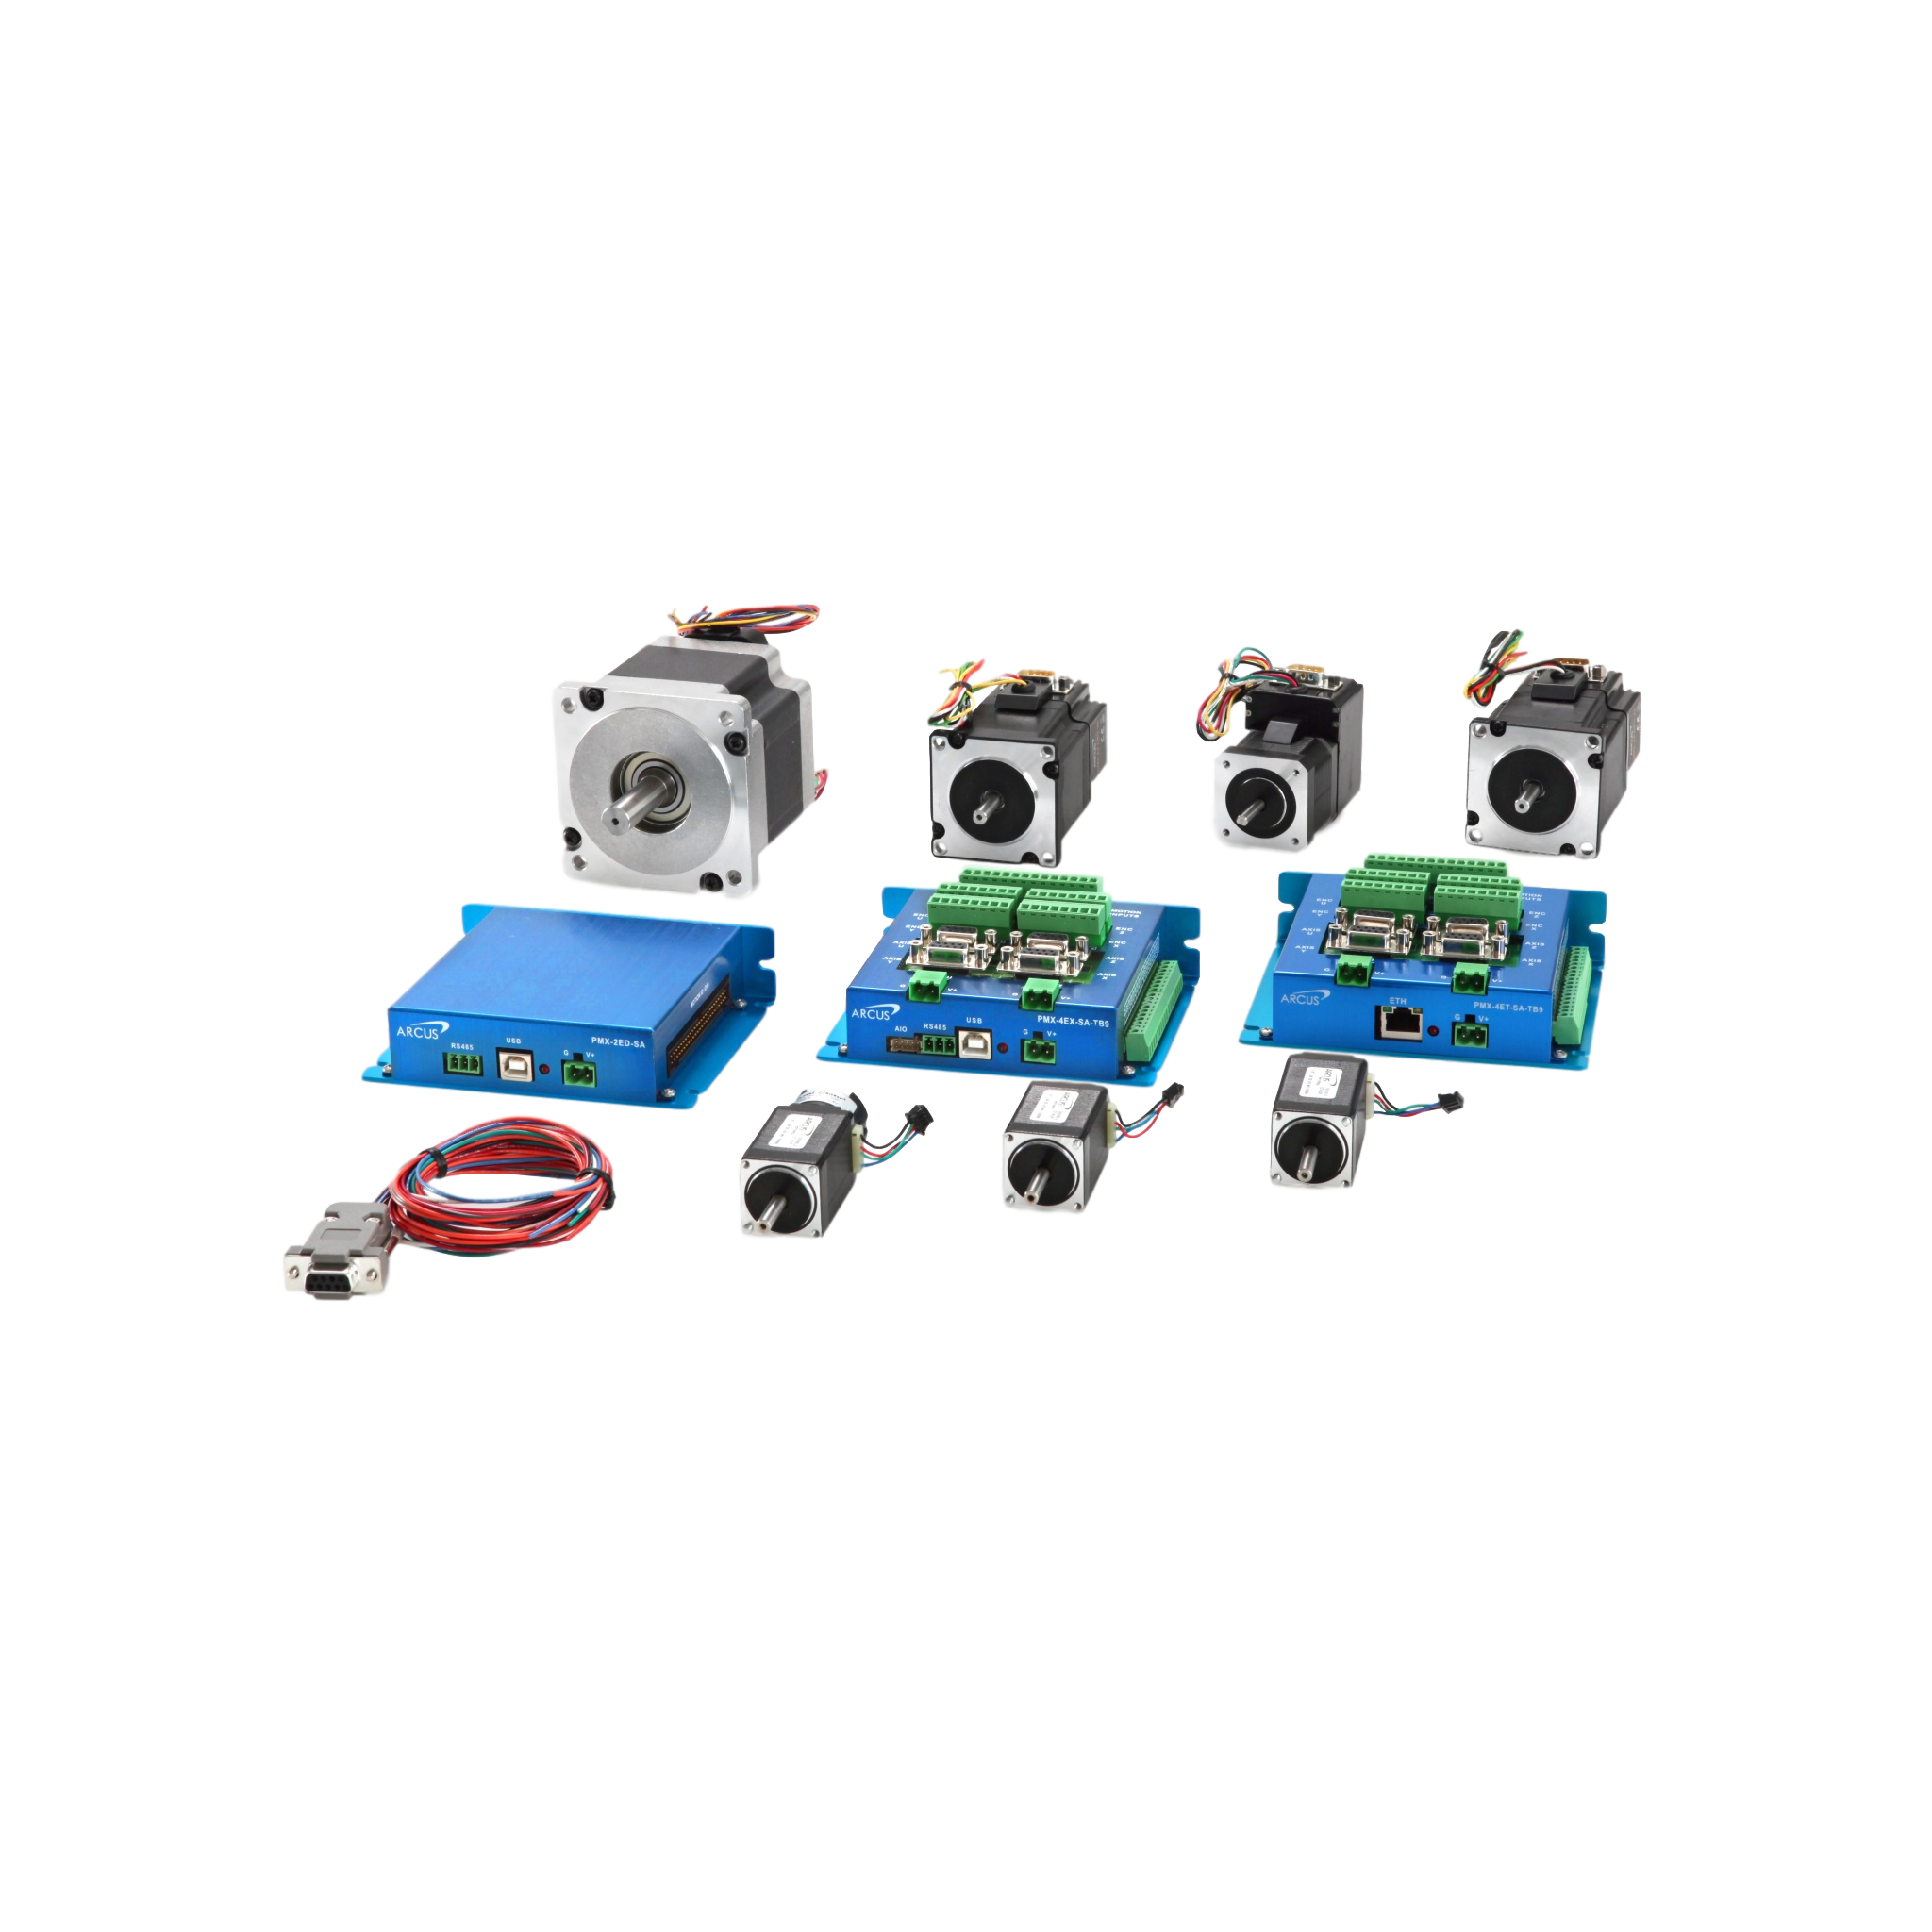 Arcus Stepper Motors / Stepper Motor Controllers